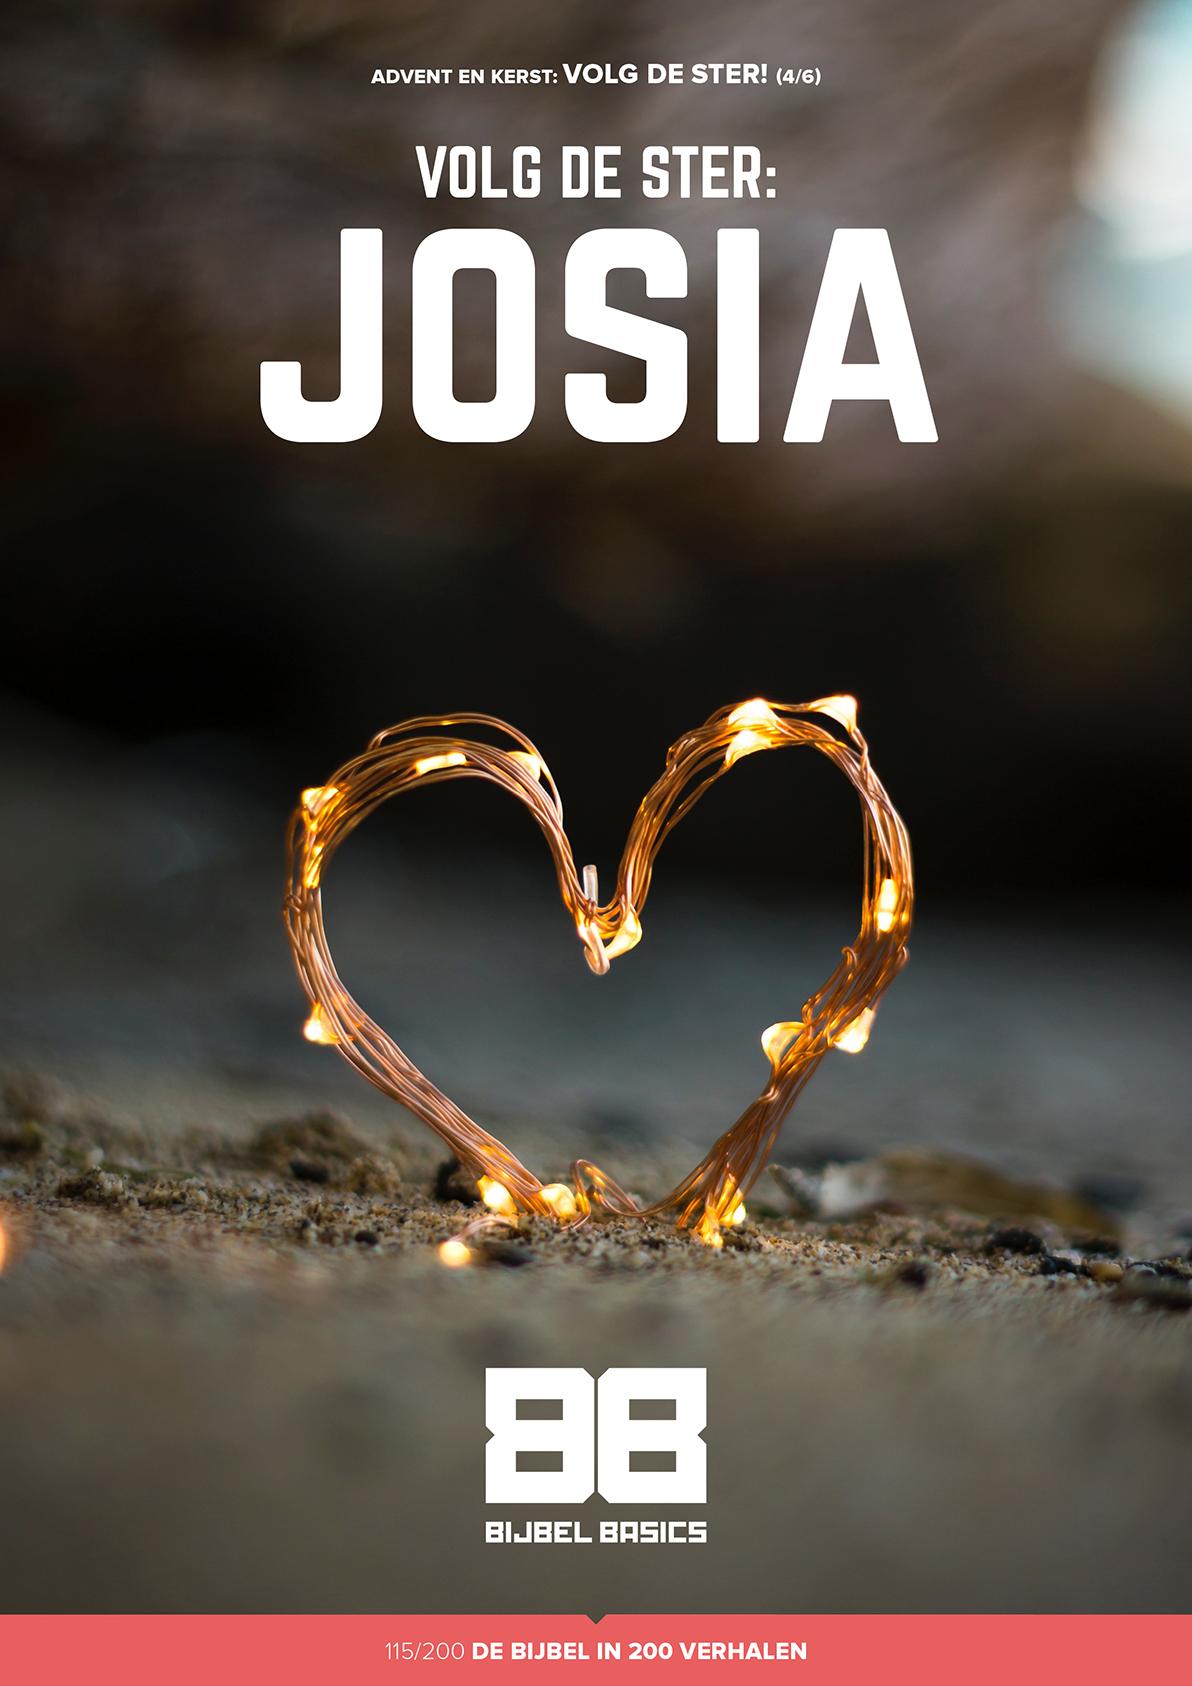 Volg de ster – Josia